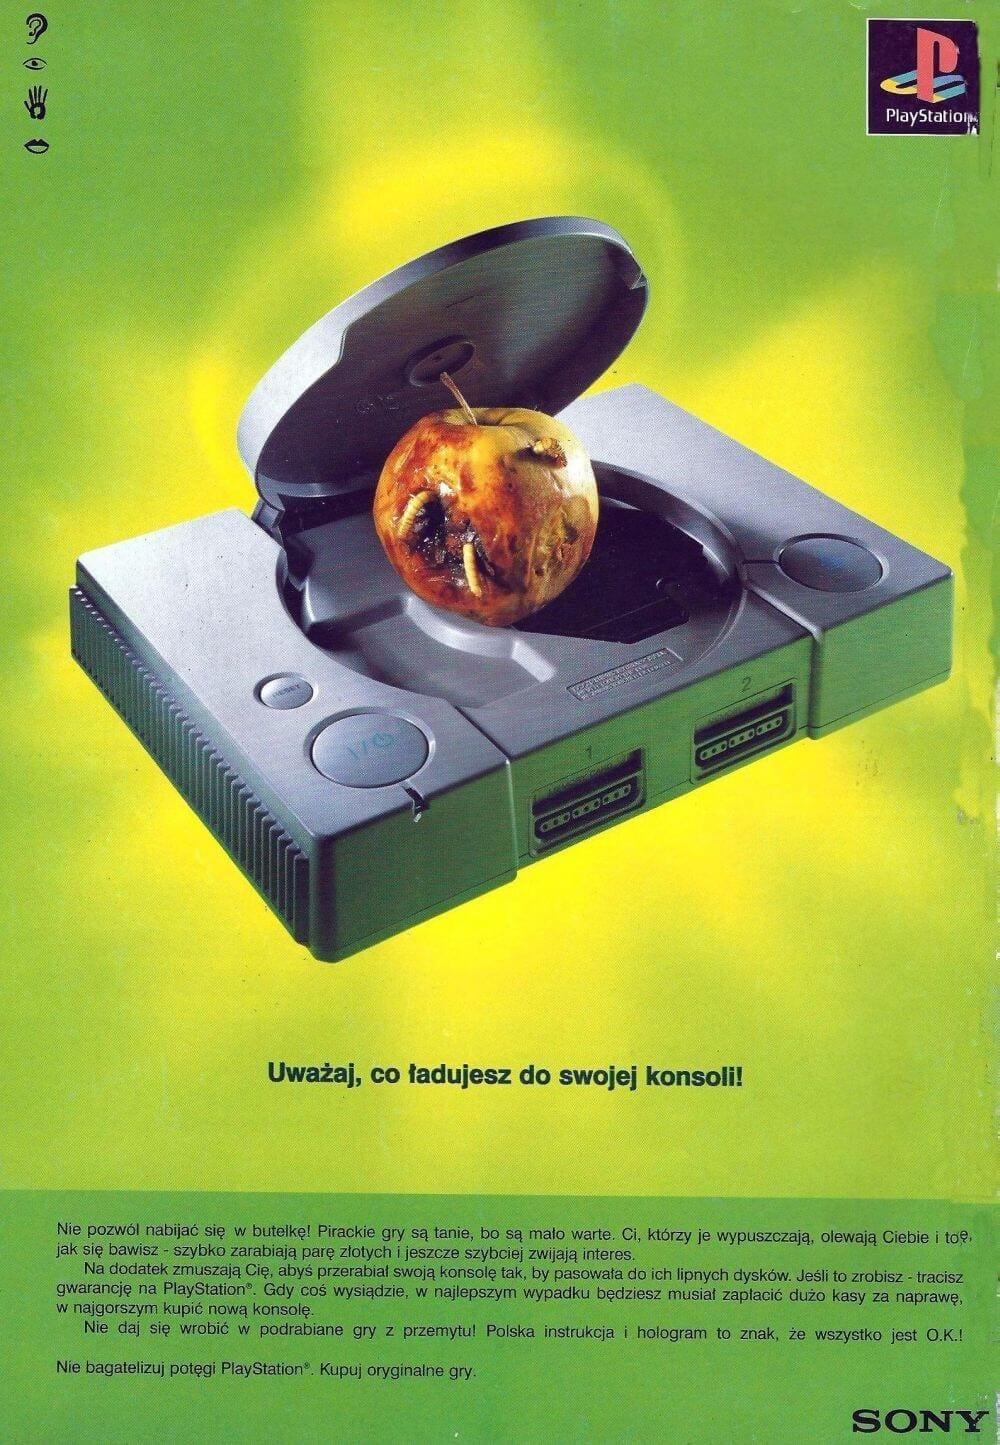 historia_playstation_w_polsce_11_neo_05_1998